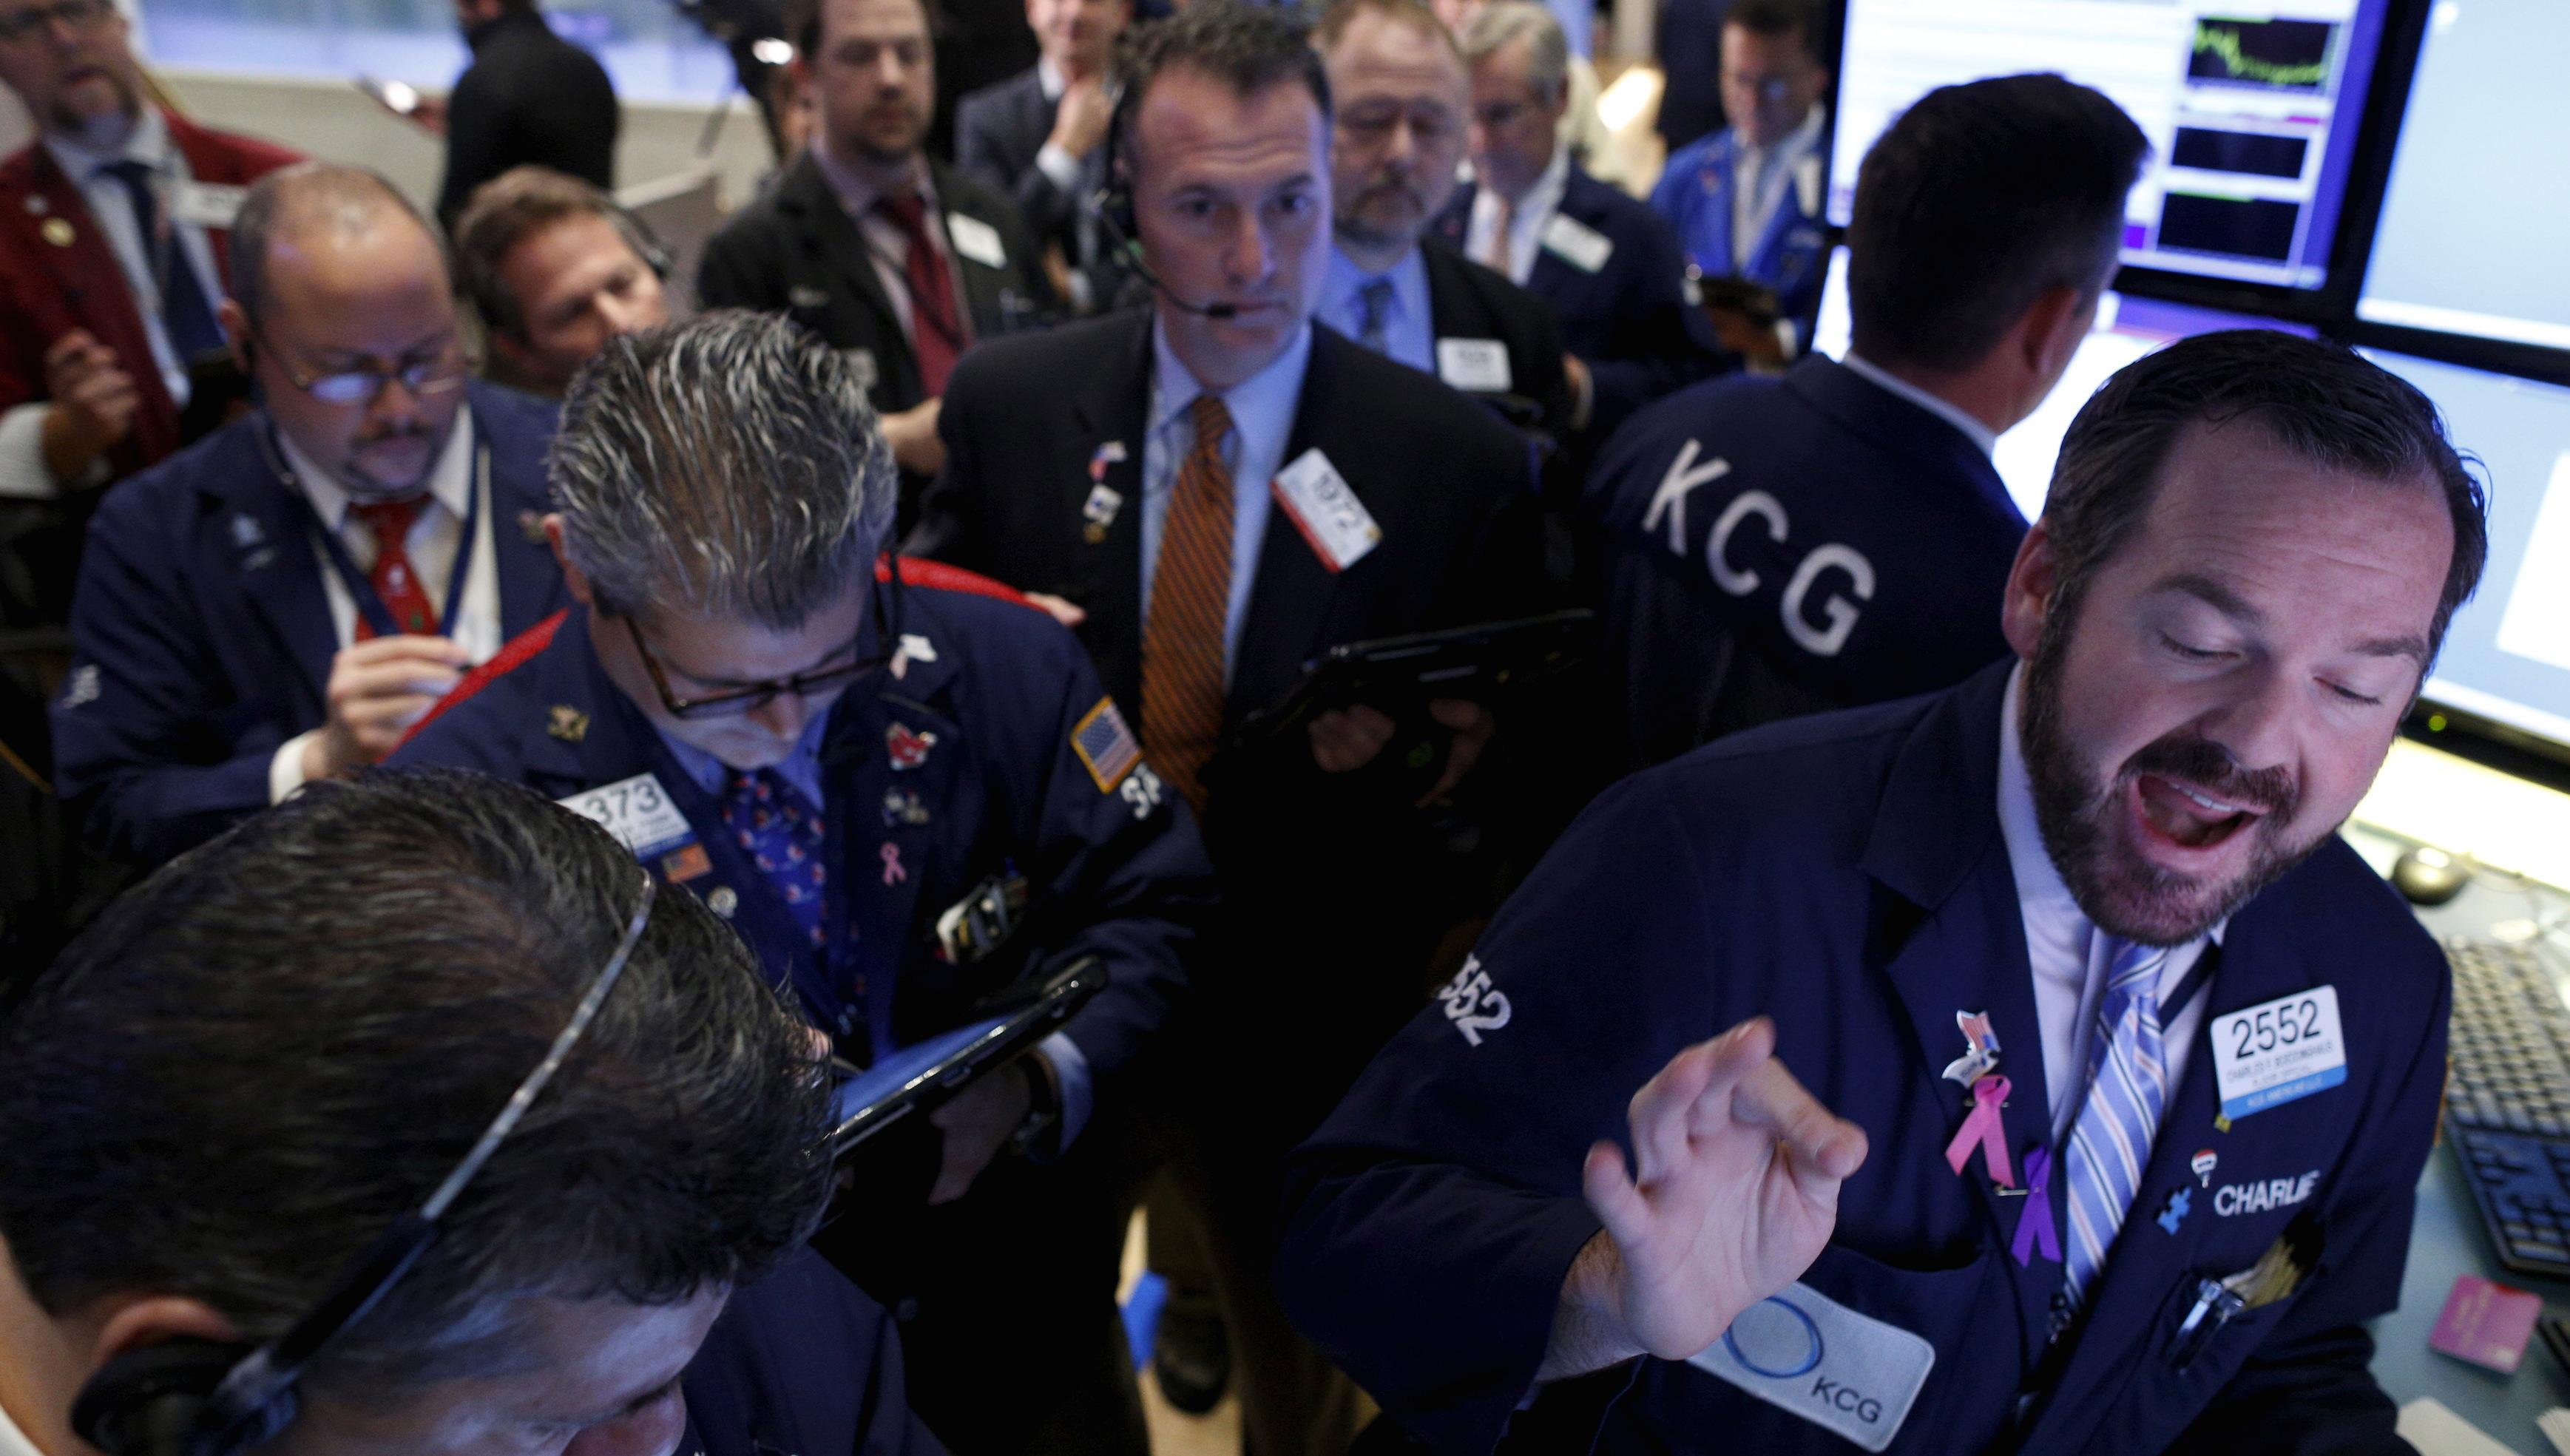 Traders work on the floor of the New York Stock Exchange December 3, 2015. REUTERS/Brendan McDermid  - RTX1X18P